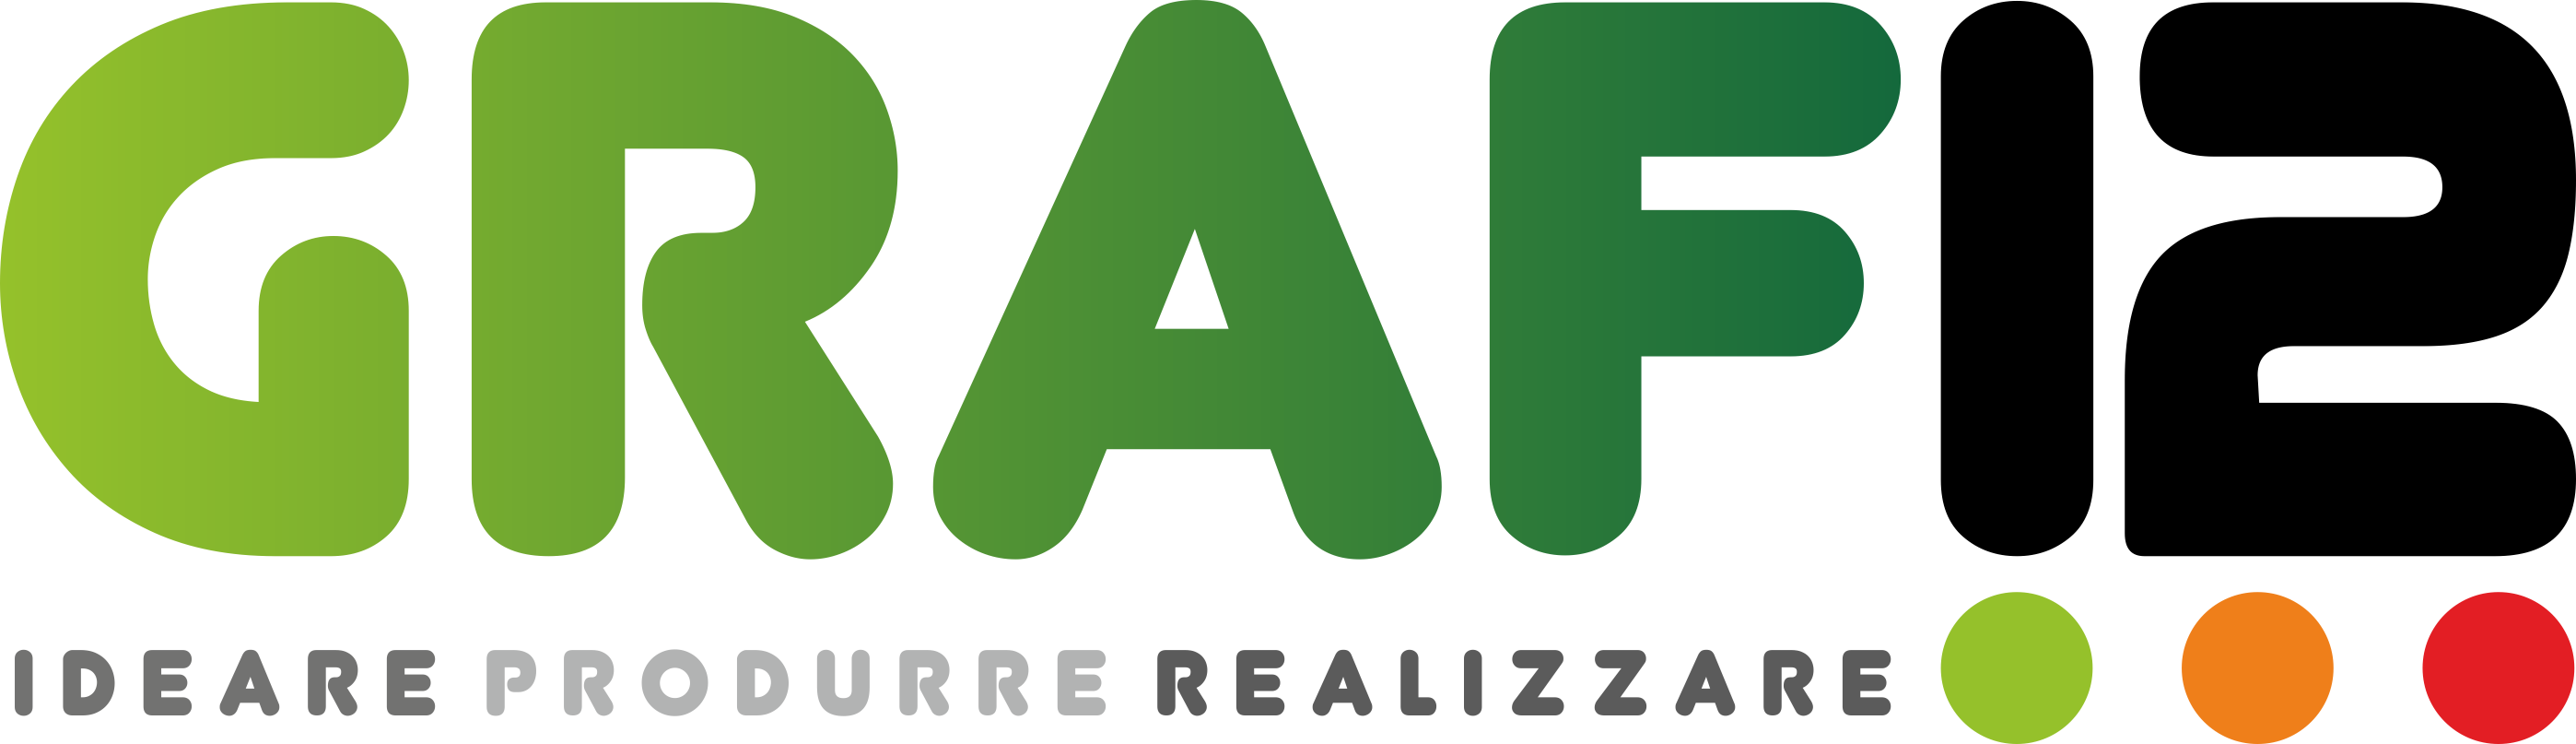 GRAFI2 logo-design